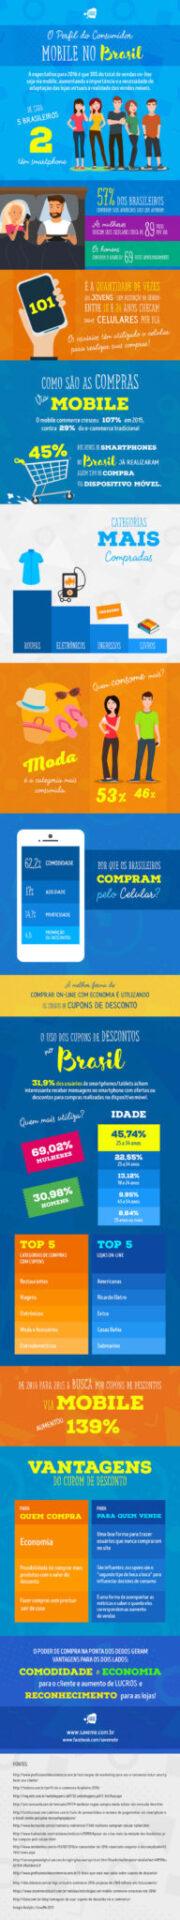 perfil-consumidor-mobile